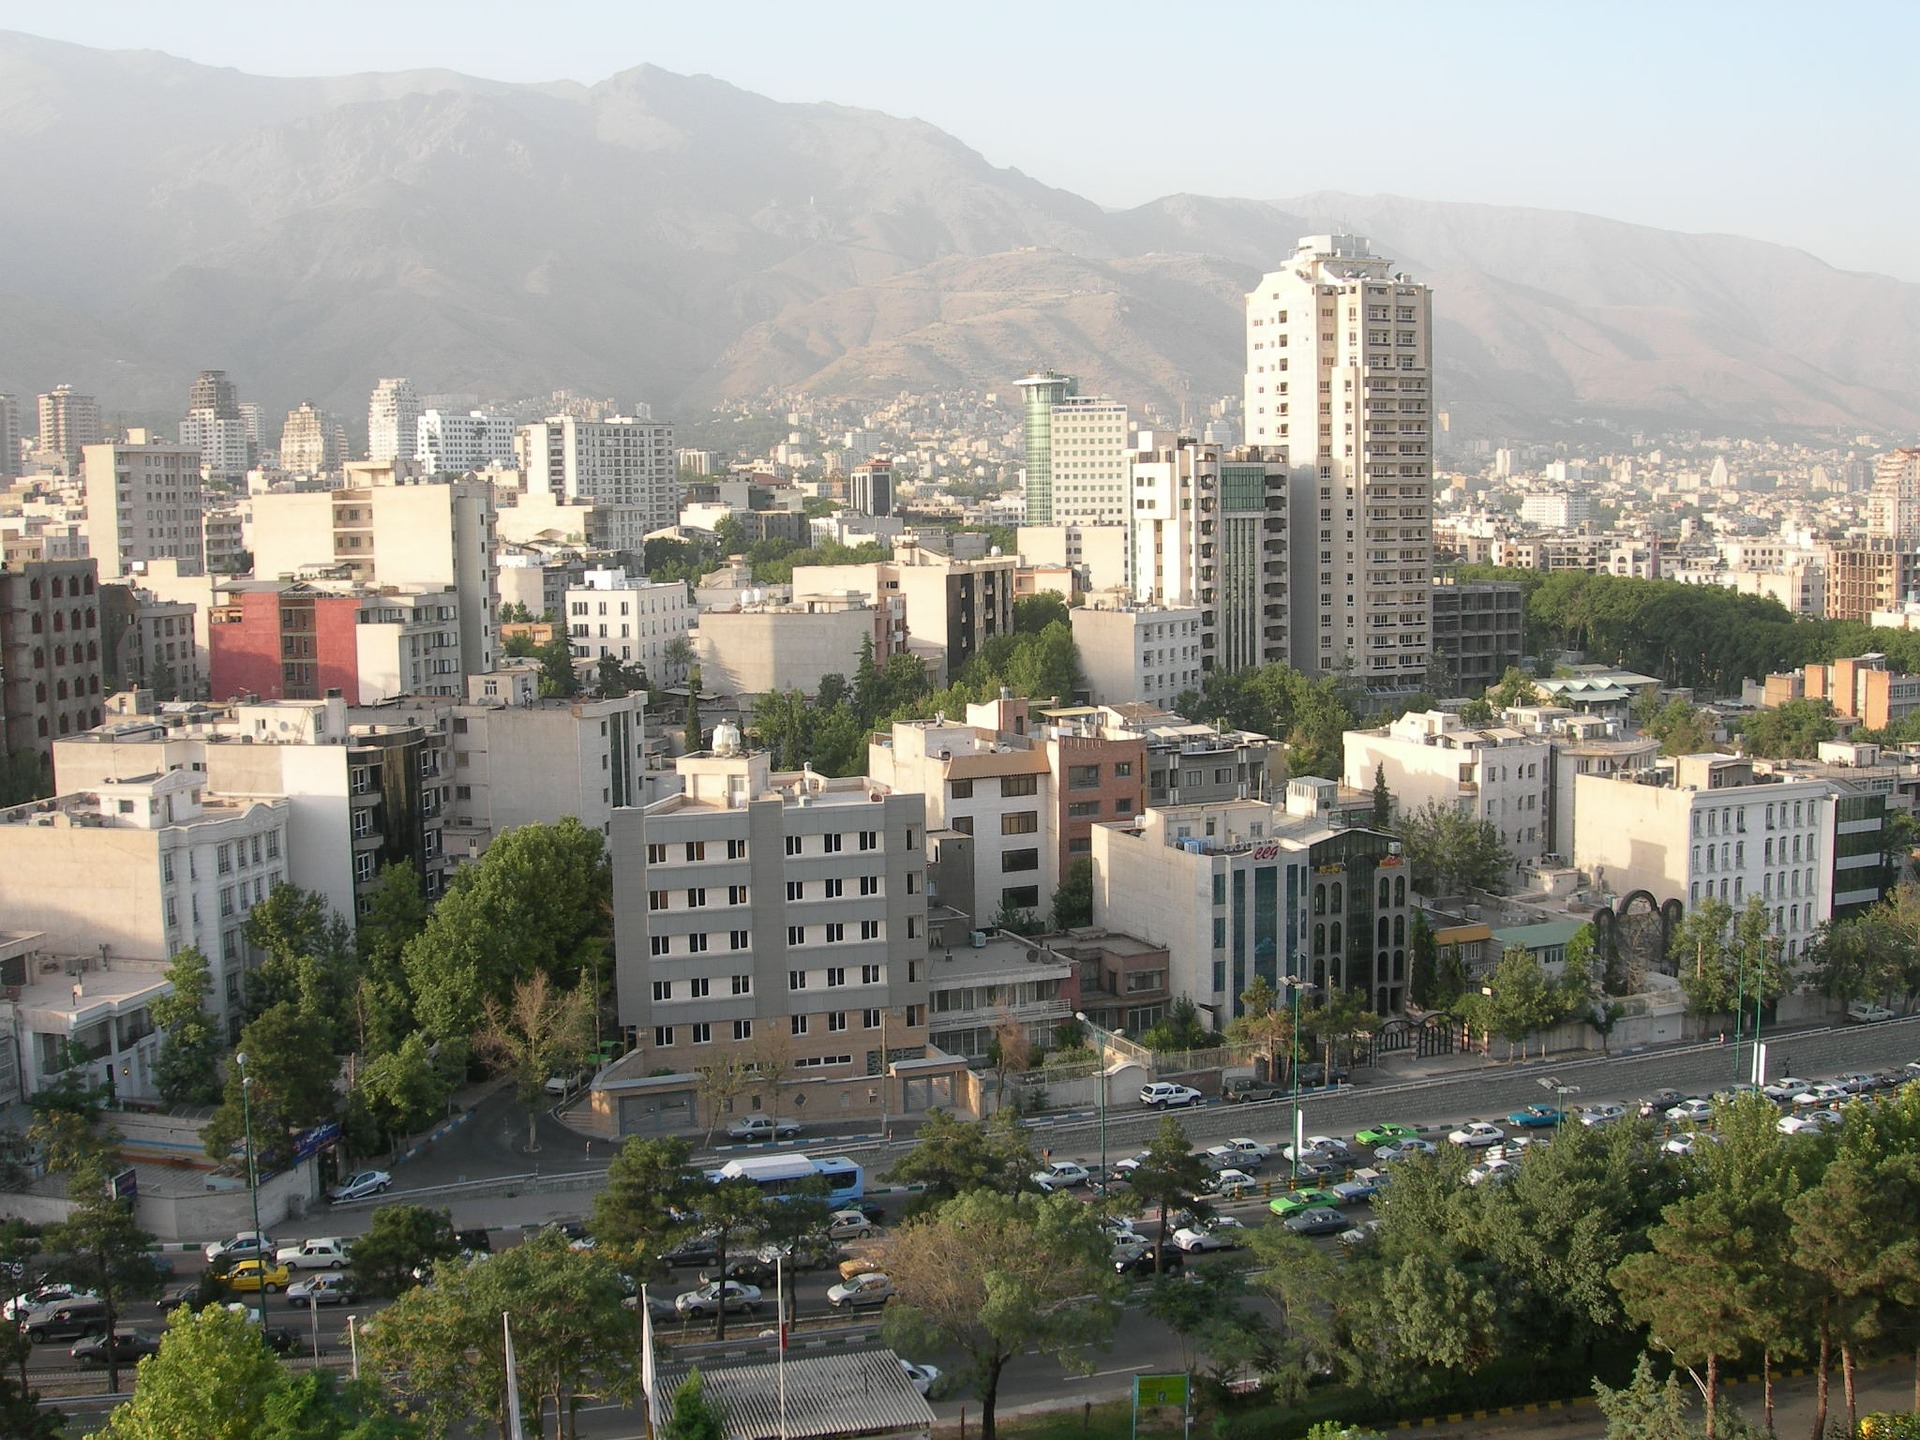 tehran-642743_1920